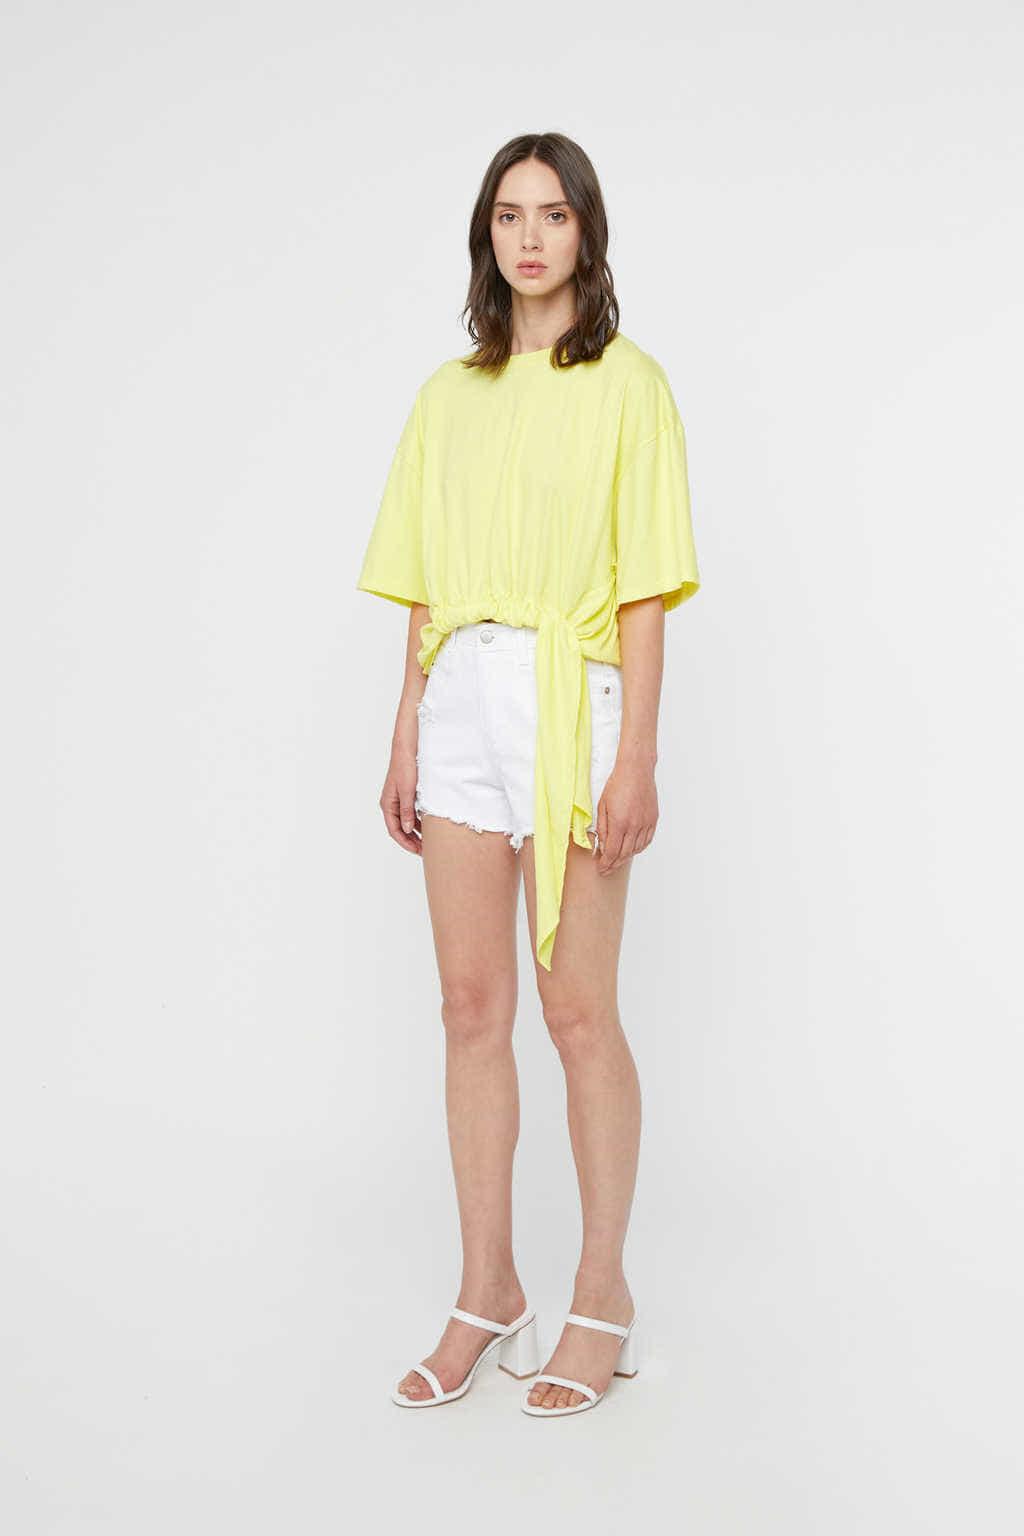 TShirt K151 Yellow 1